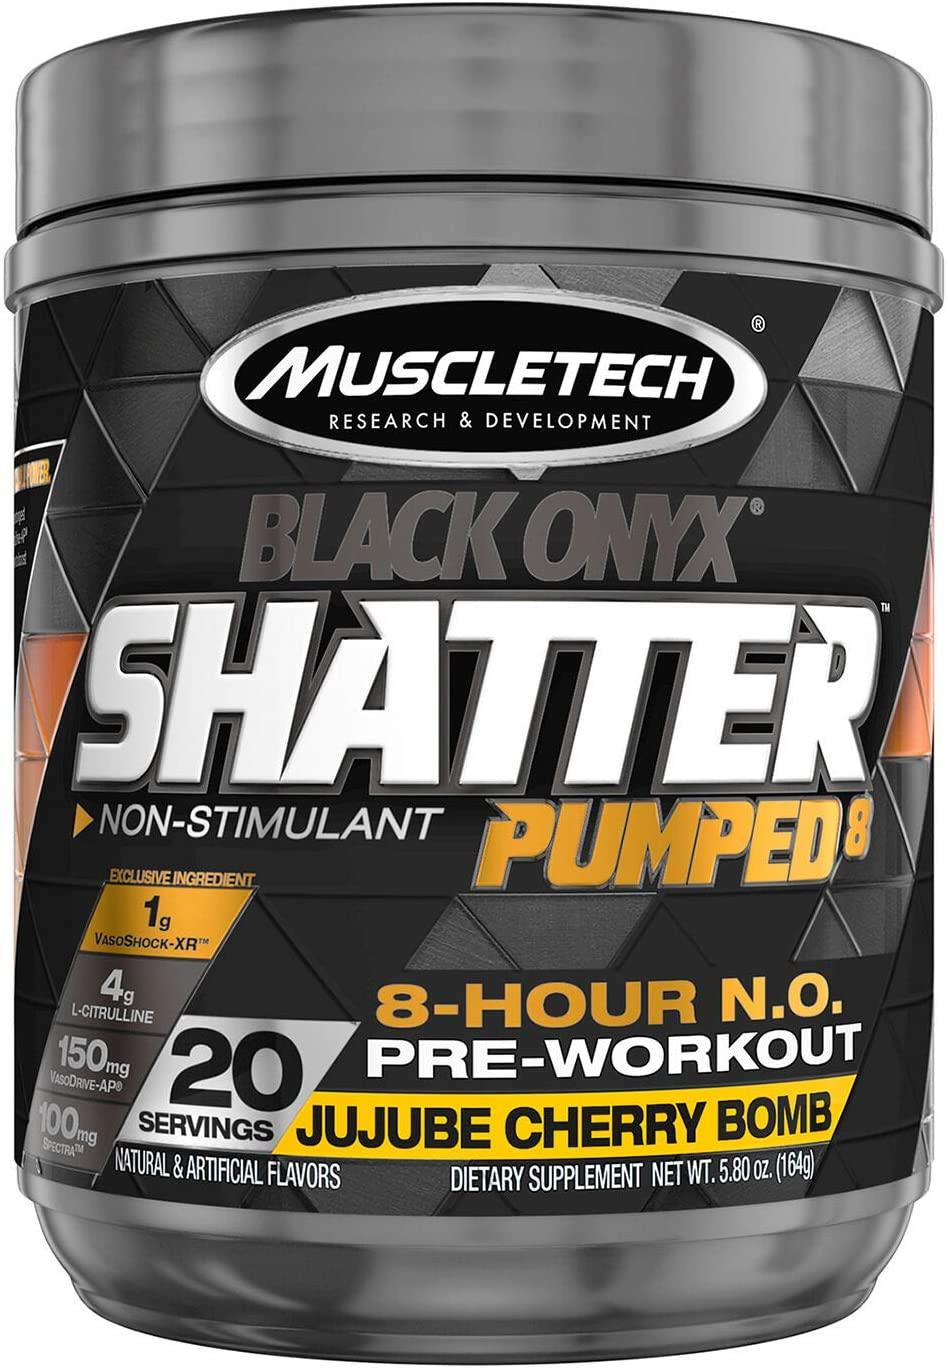 MuscleTech Shatter Pumped 8 Black Onyx - JuJube Cherry Bomb